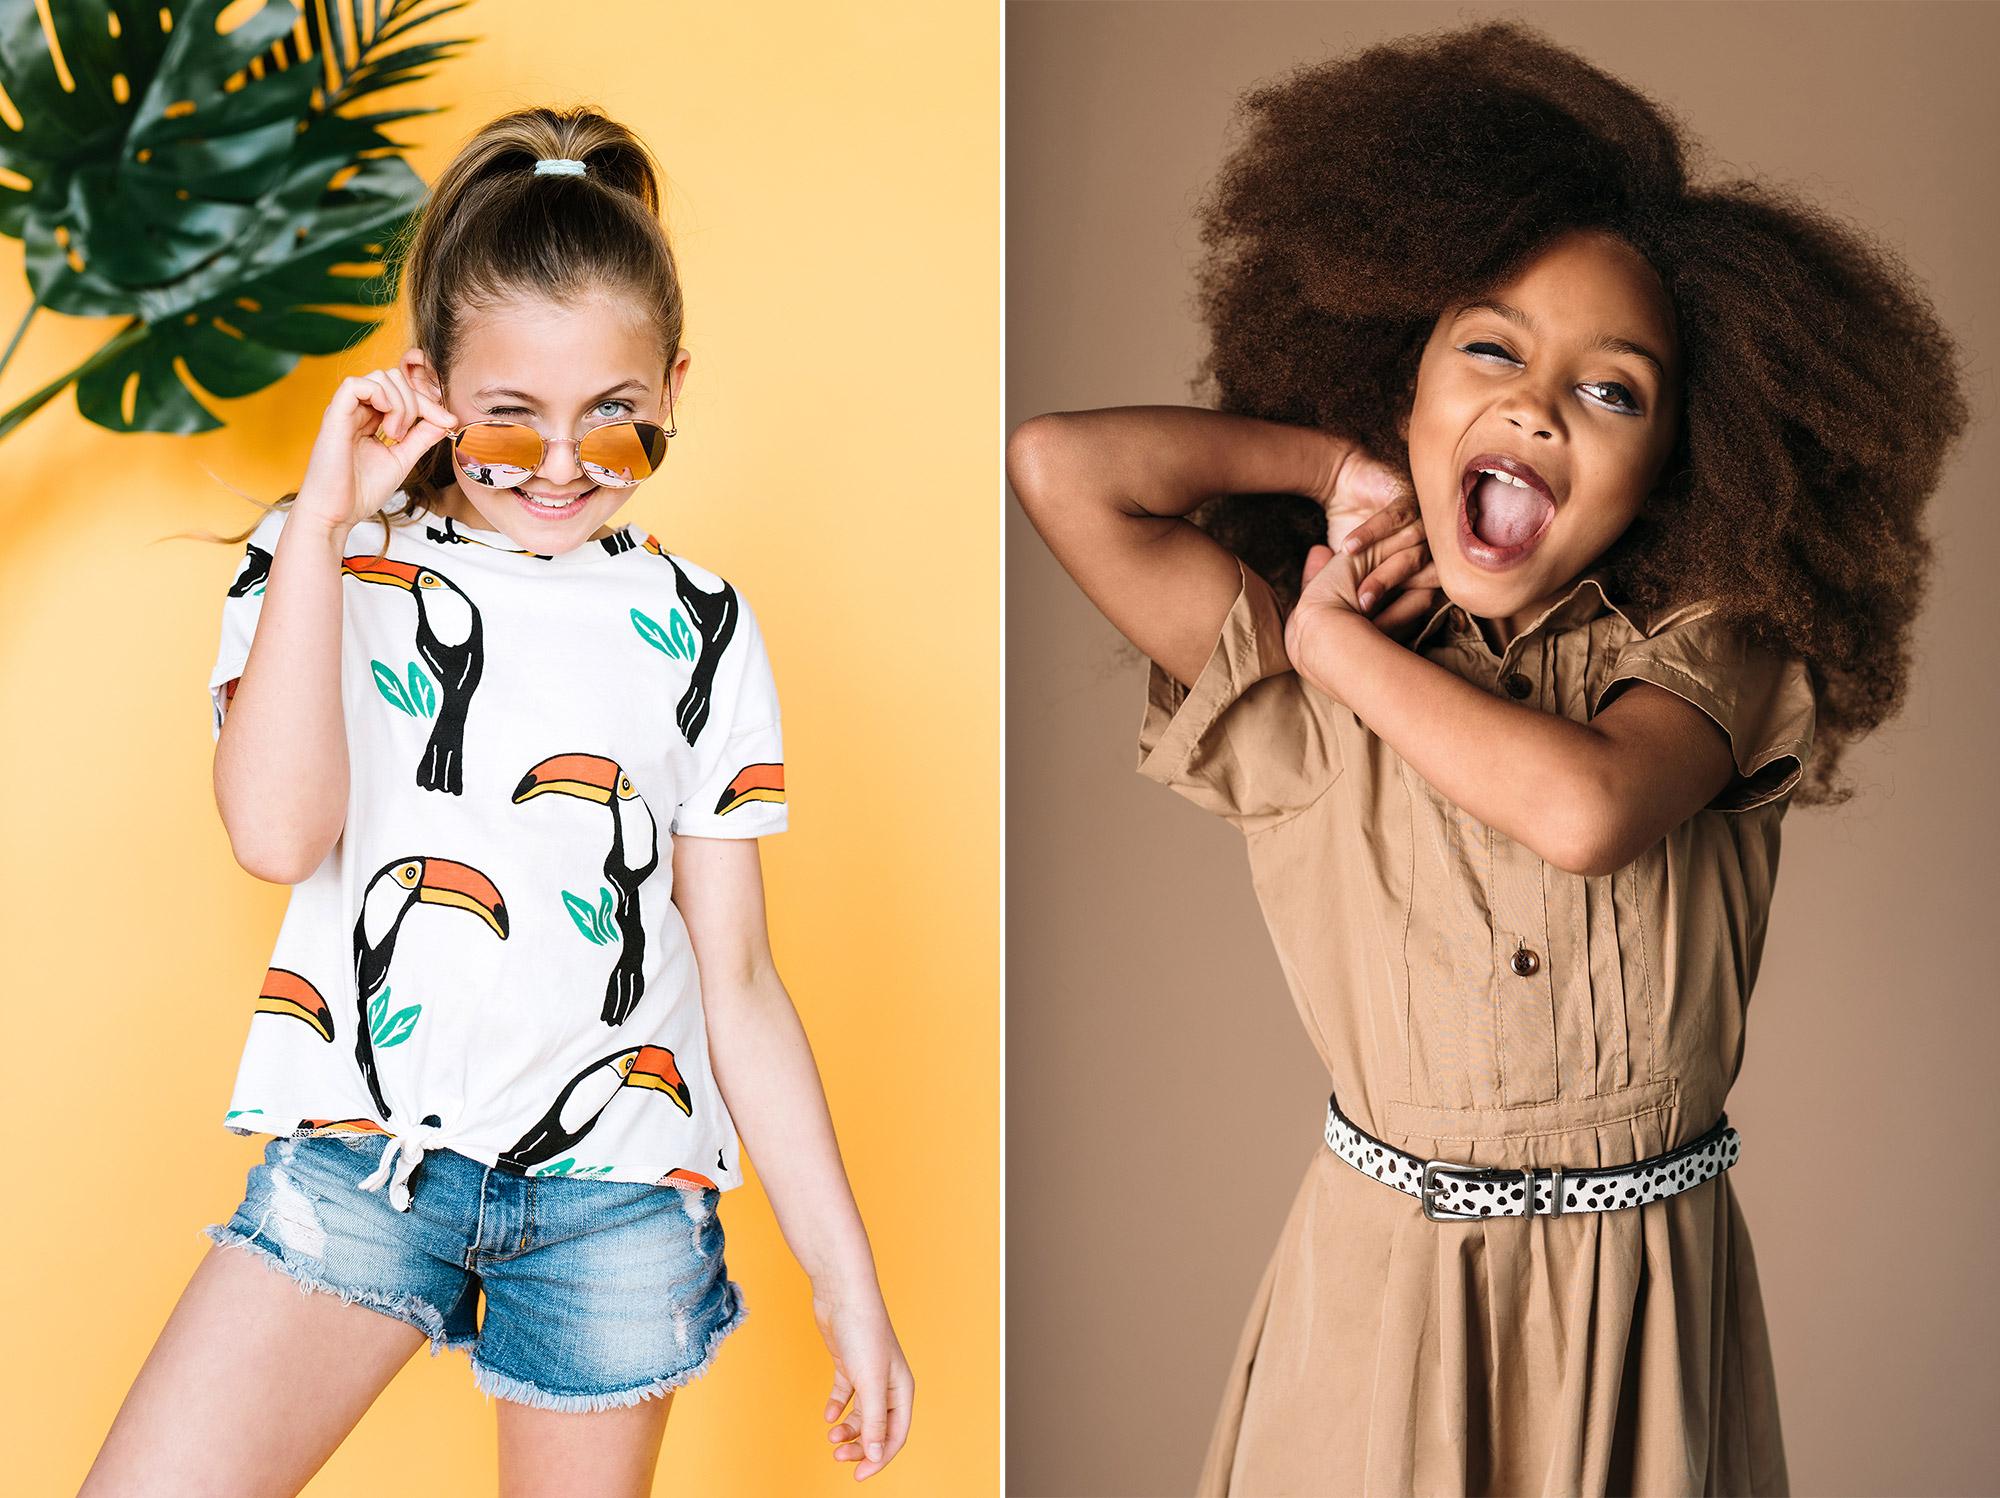 tenley-clark-expressive-kids-teen-styled-portraits-27